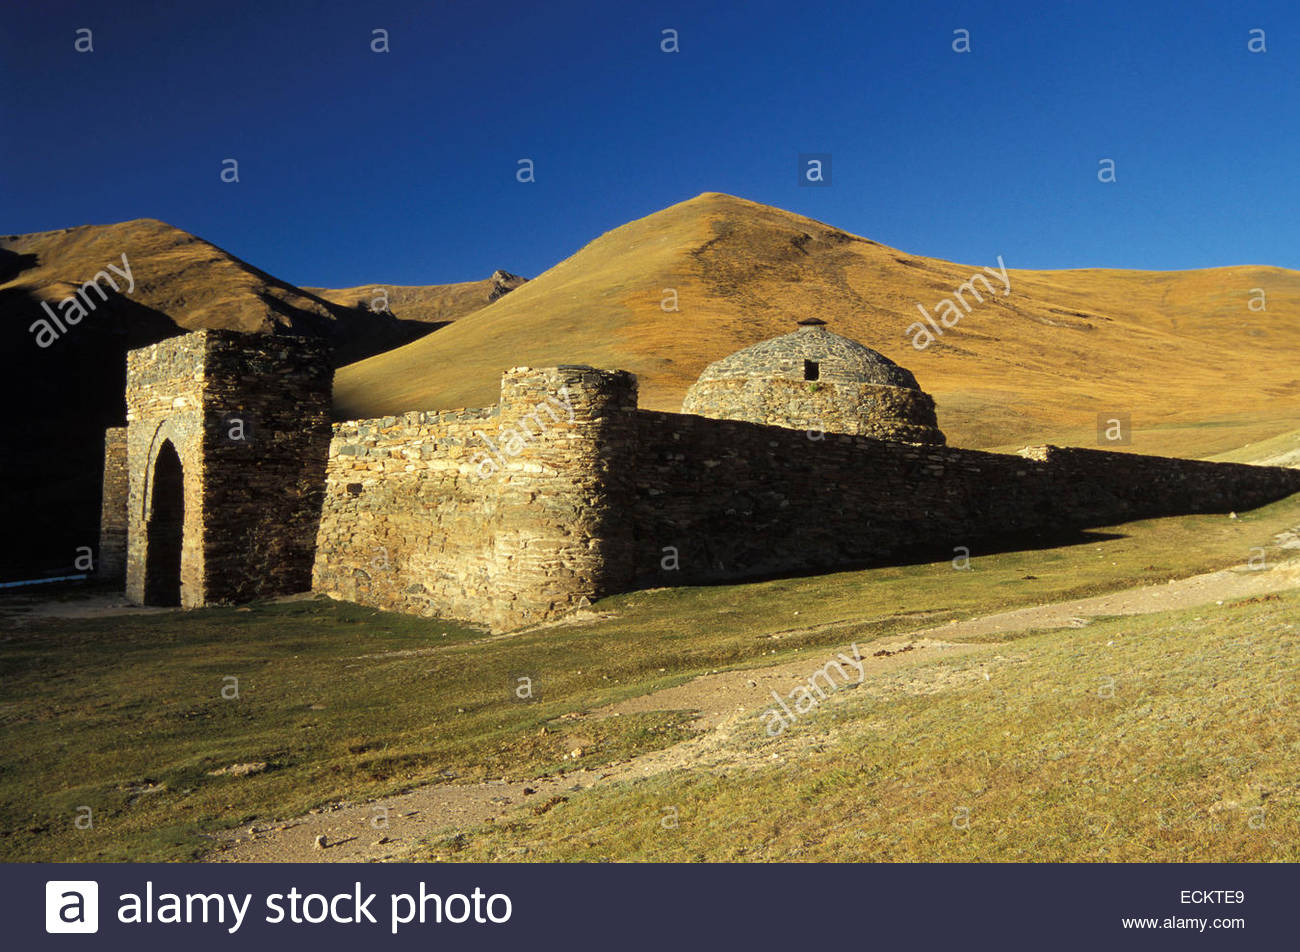 Kyrgyzstan, Caravanserai of Tash Rabat. - Stock Image